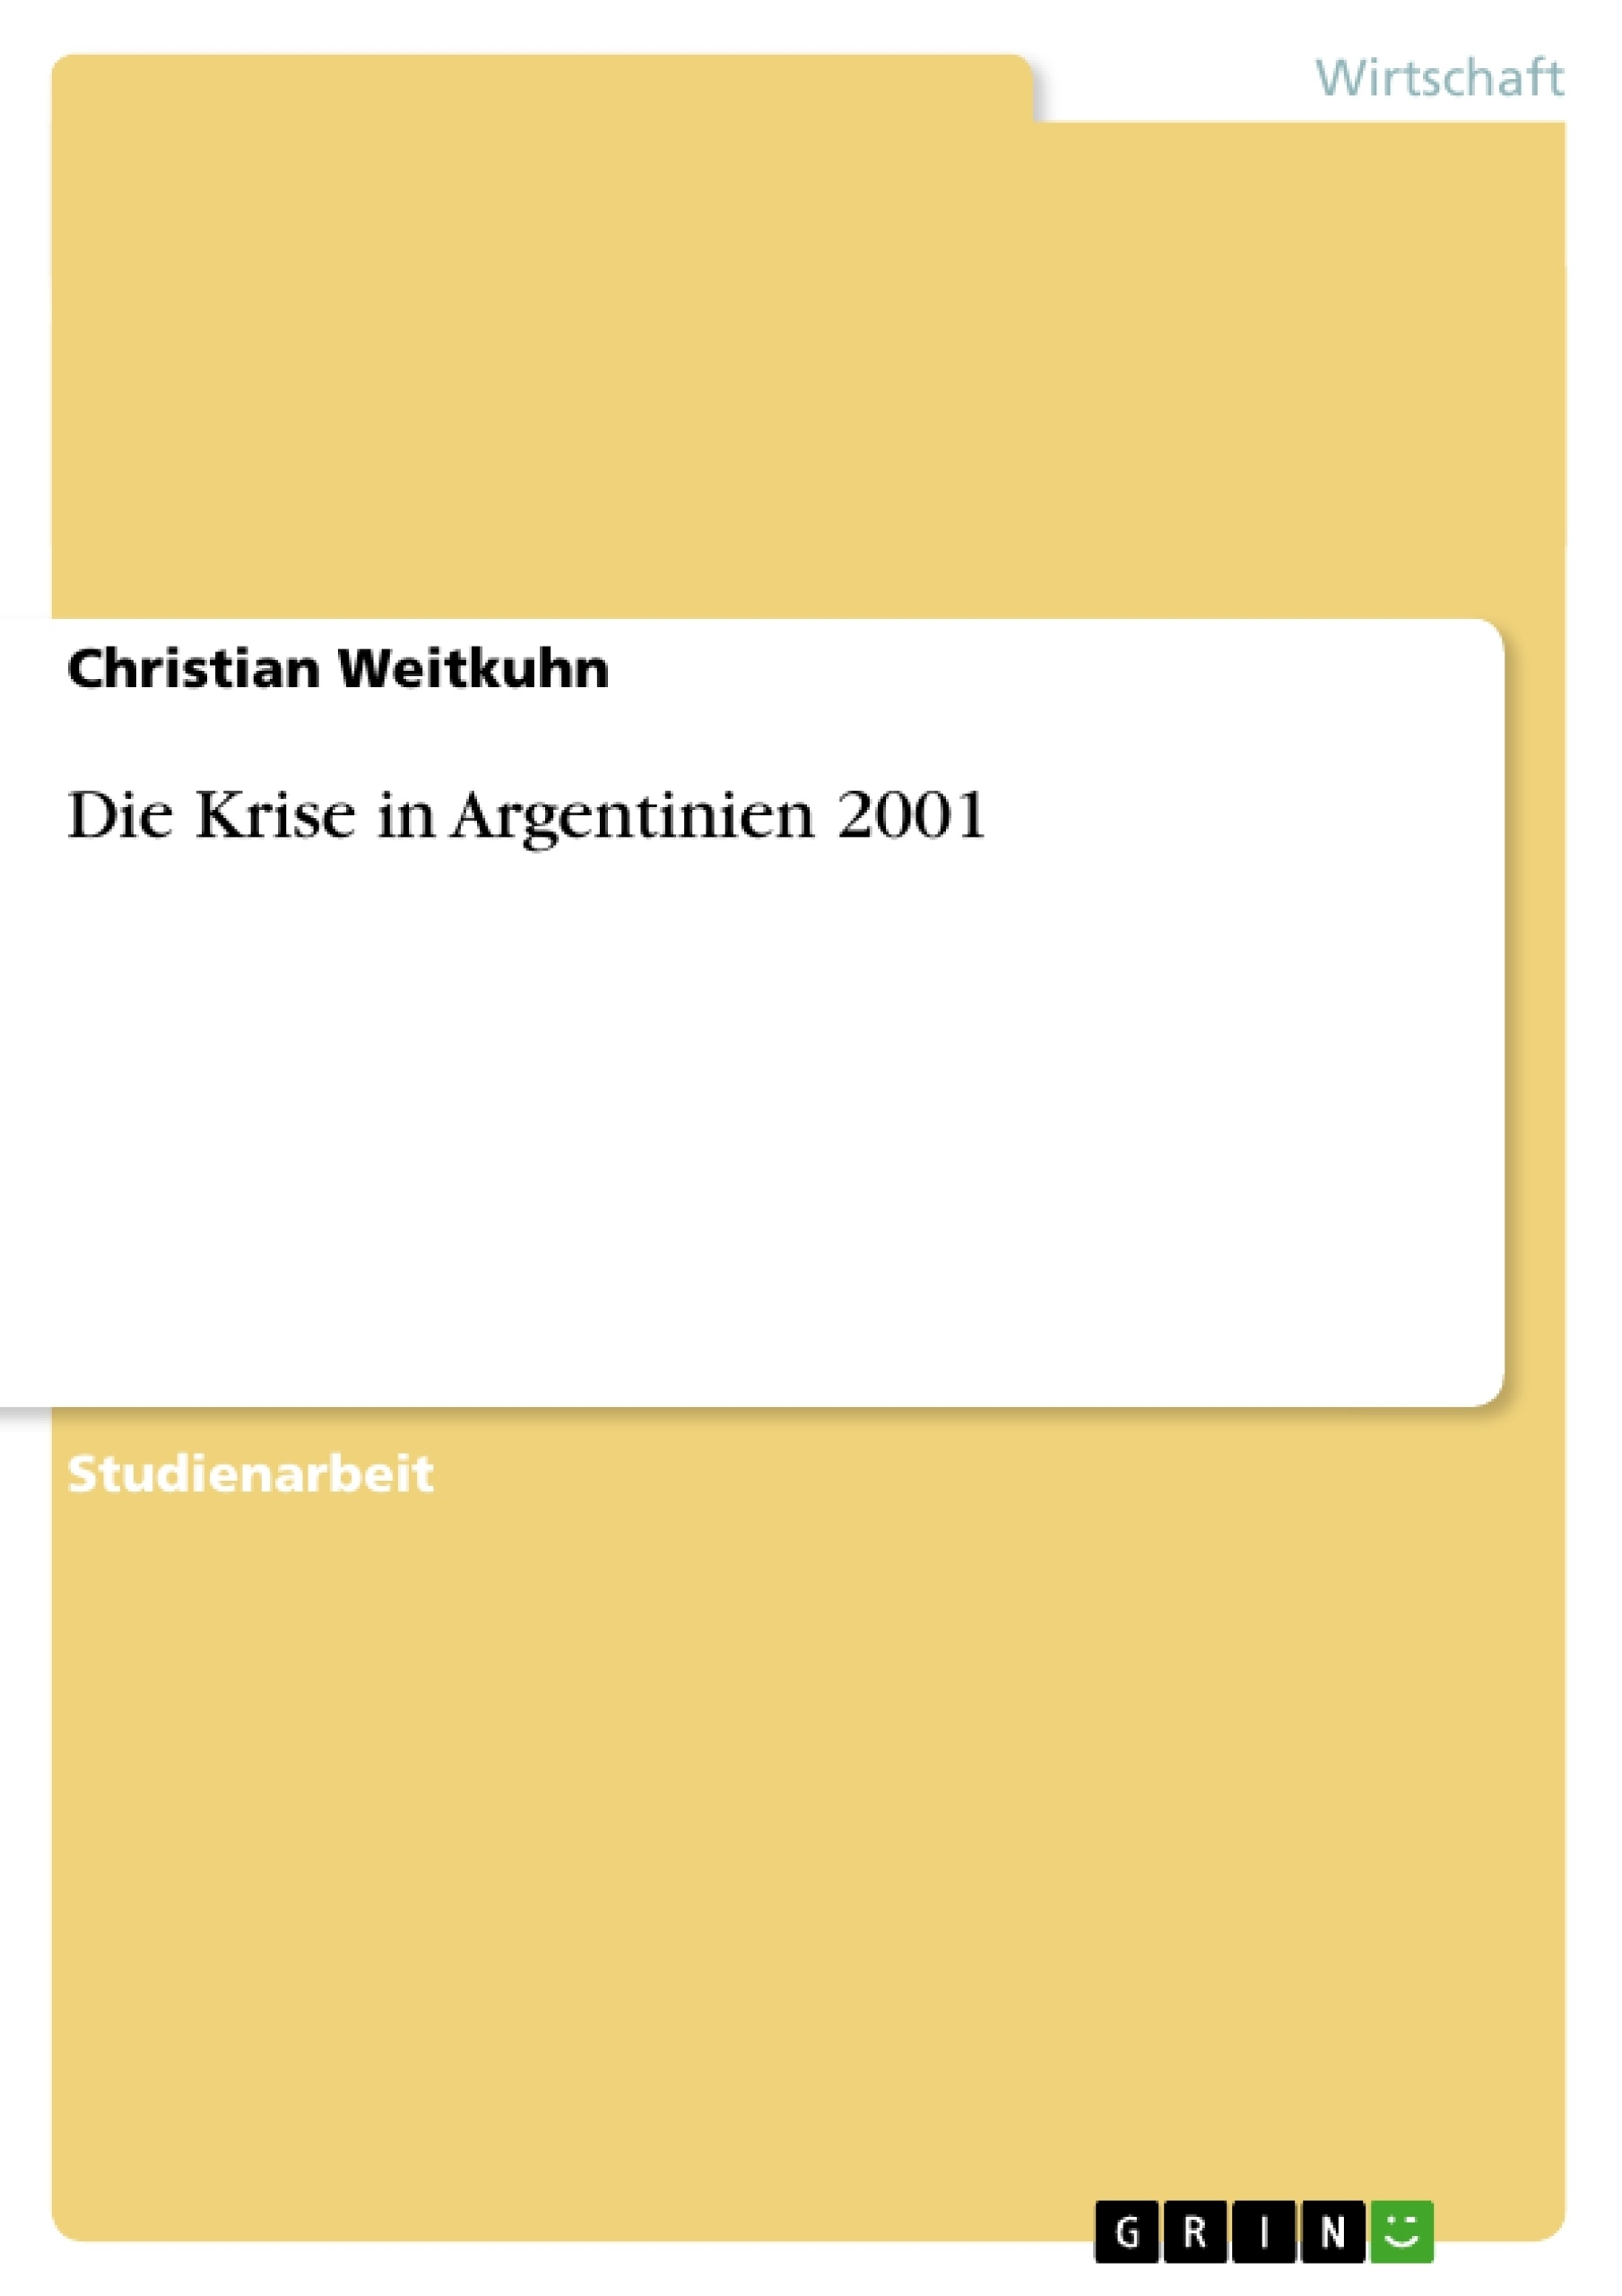 Titel: Die Krise in Argentinien 2001